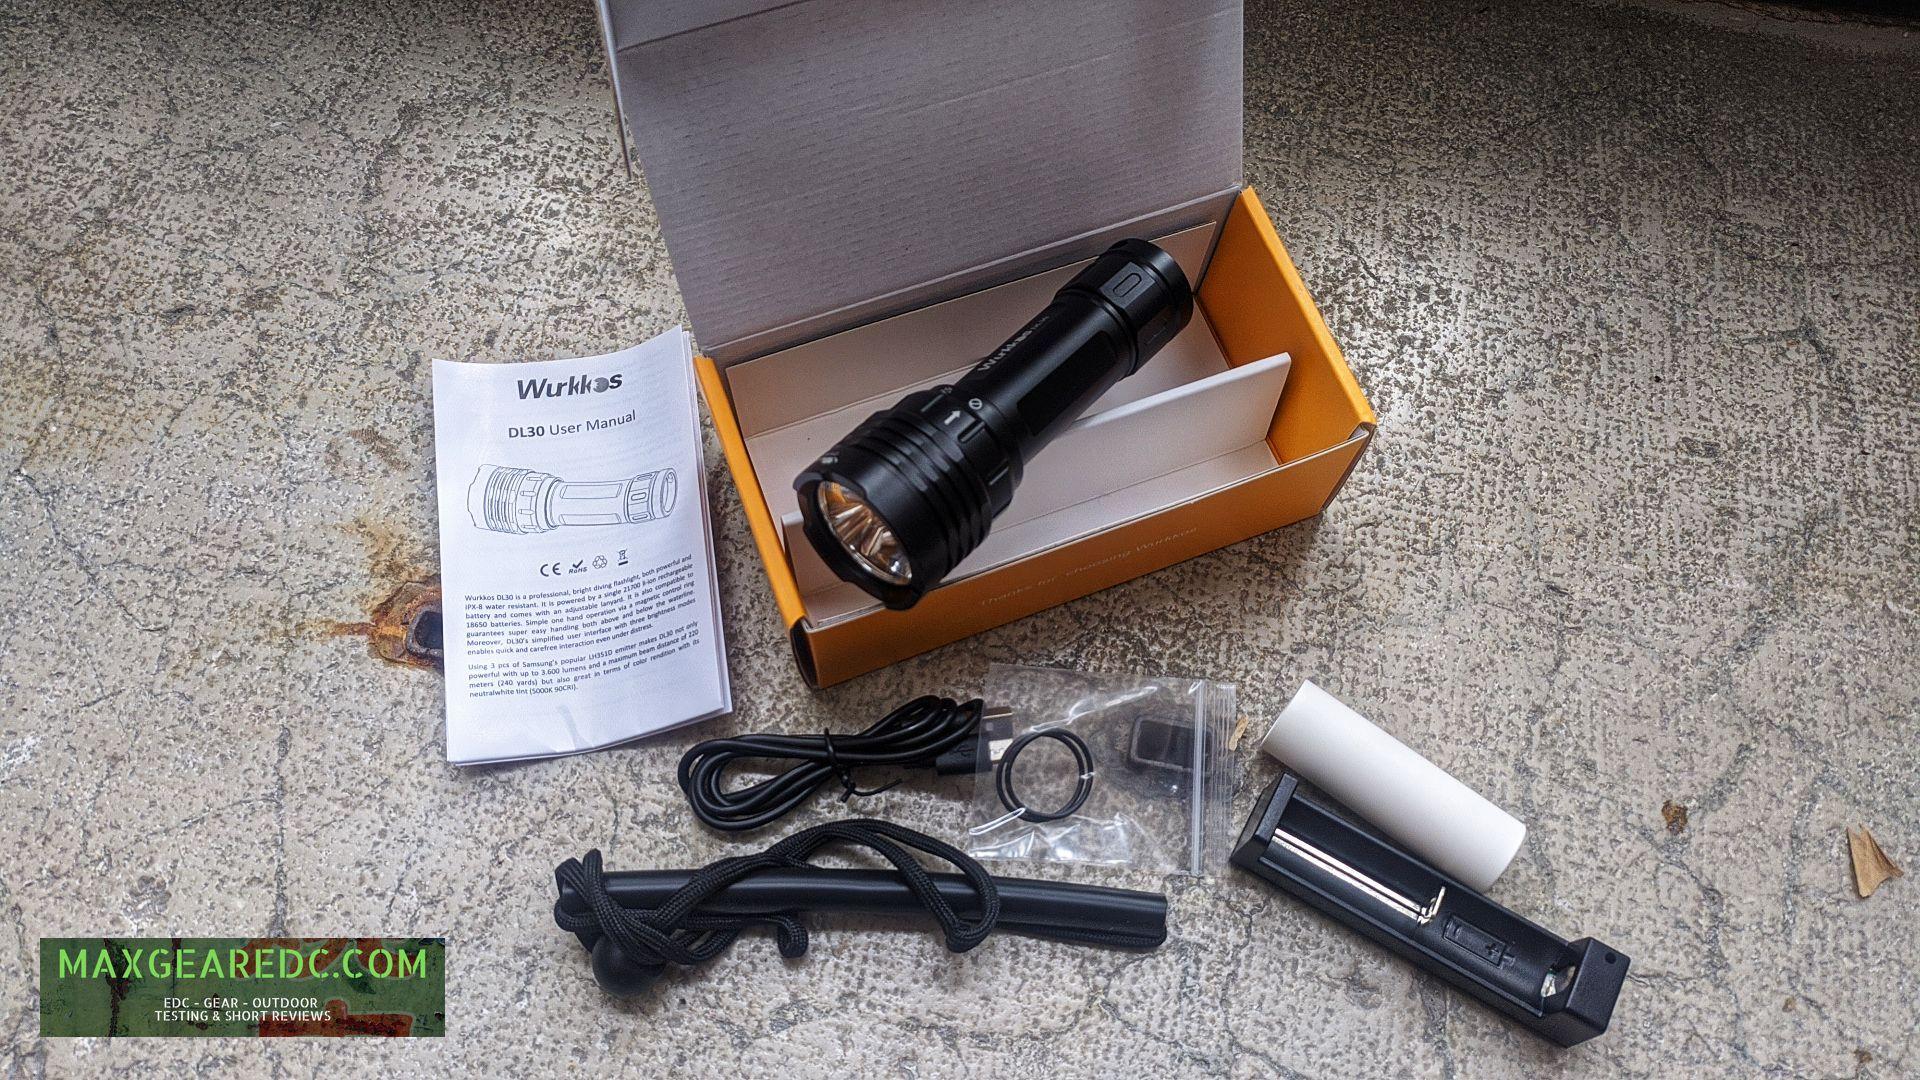 Wurkkos_DL30_Diving_Flashlight_Review_Aluminium_21700_maxgearedc.com_EDC_GEAR_OUTDOOR_TESTING_and_SHORT_REVIEWS_3